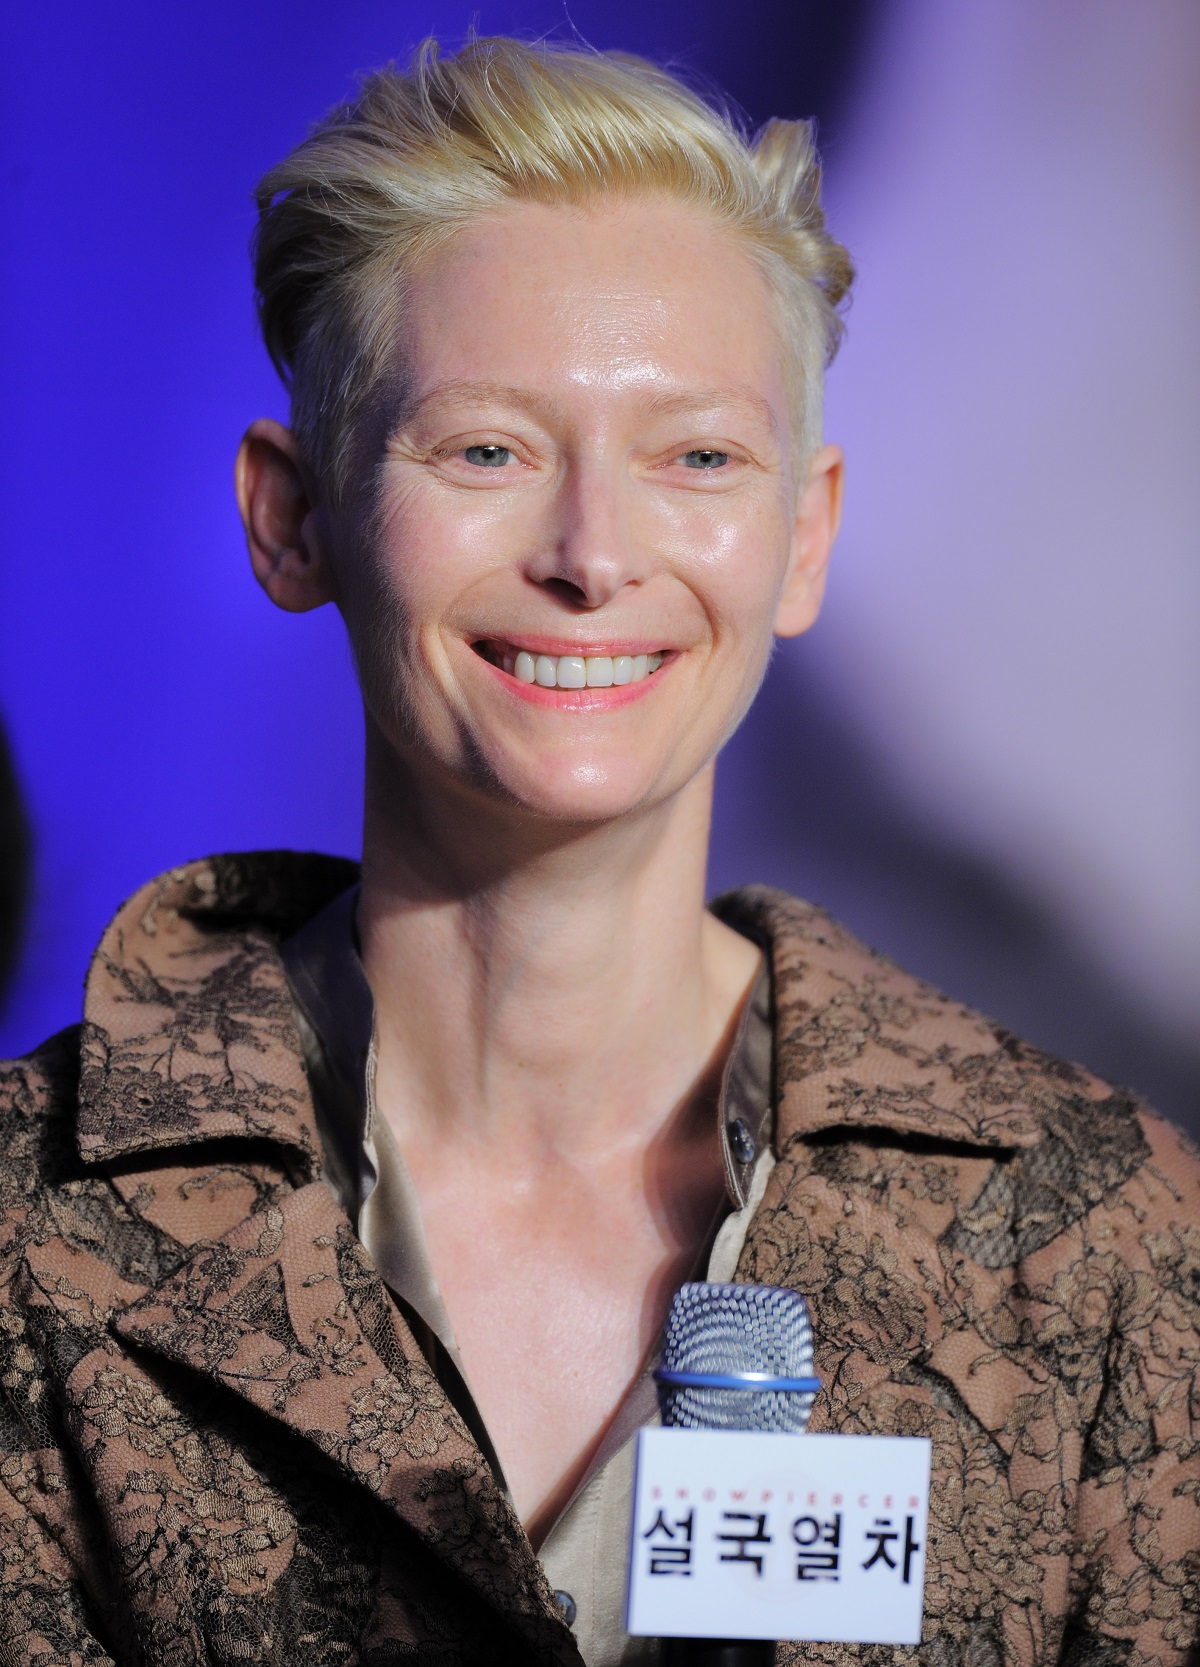 Tilda Swinton at the 'Snowpiercer' press conference in 2013